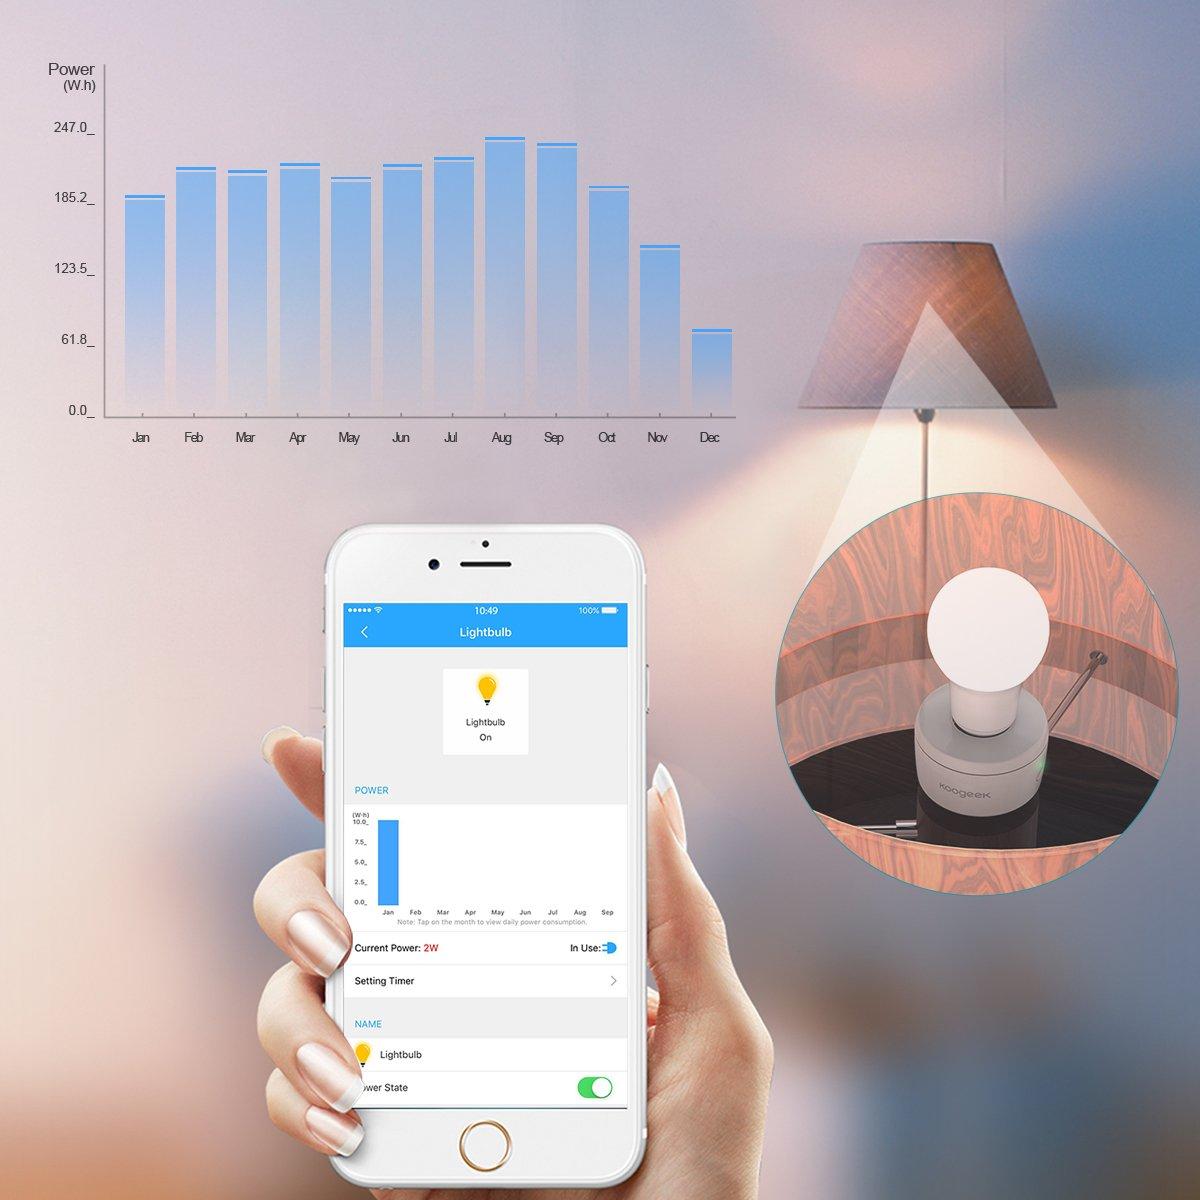 Koogeek Smart Socket WiFi Enabled E26 Light Bulb Adapter Works with Apple HomeKit Support Siri Voice Control Home App on 2.4Ghz Network by Koogeek (Image #2)